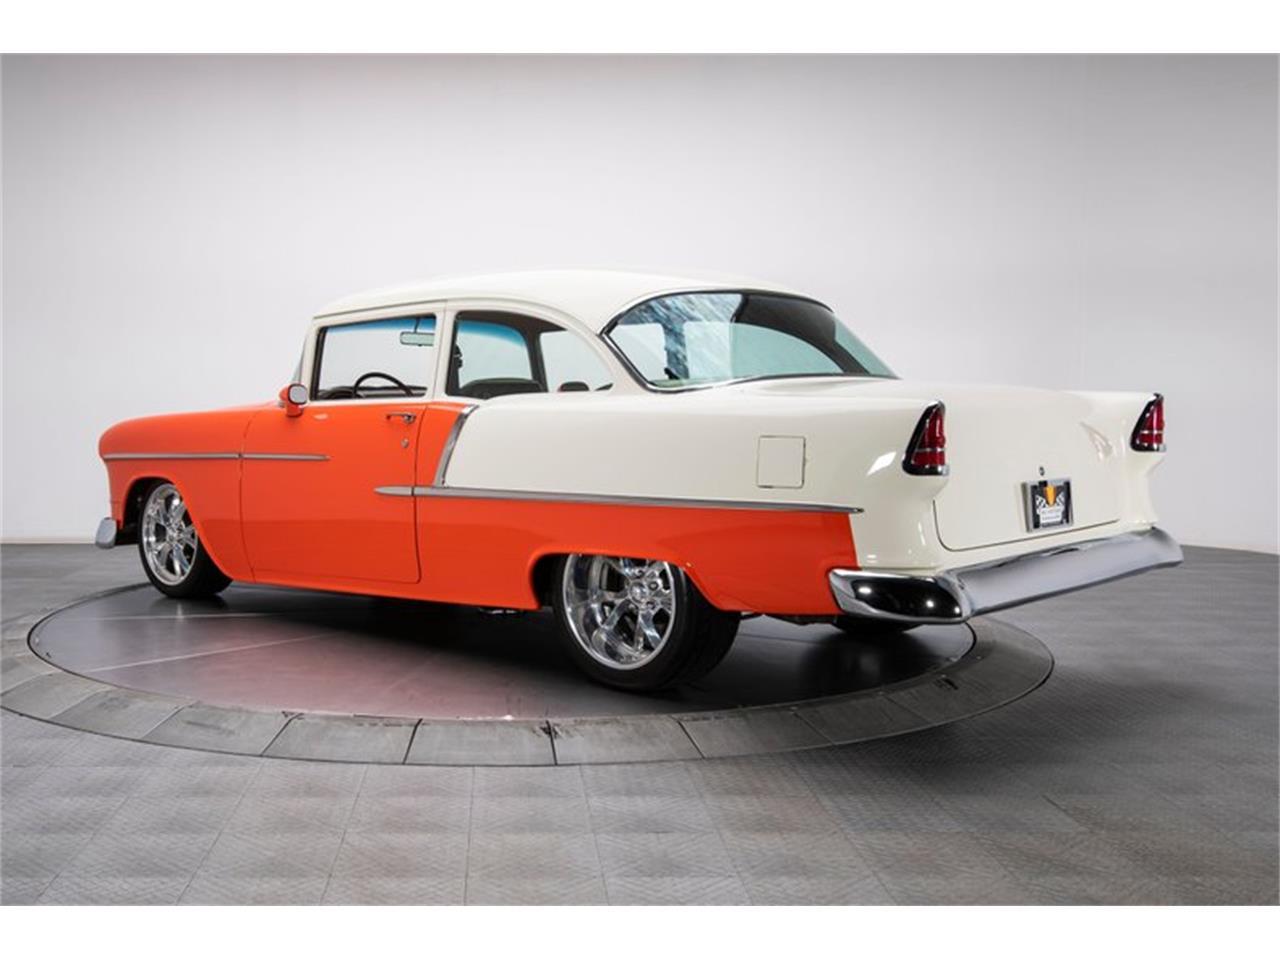 1955 Chevrolet Bel Air (CC-1363889) for sale in Charlotte, North Carolina